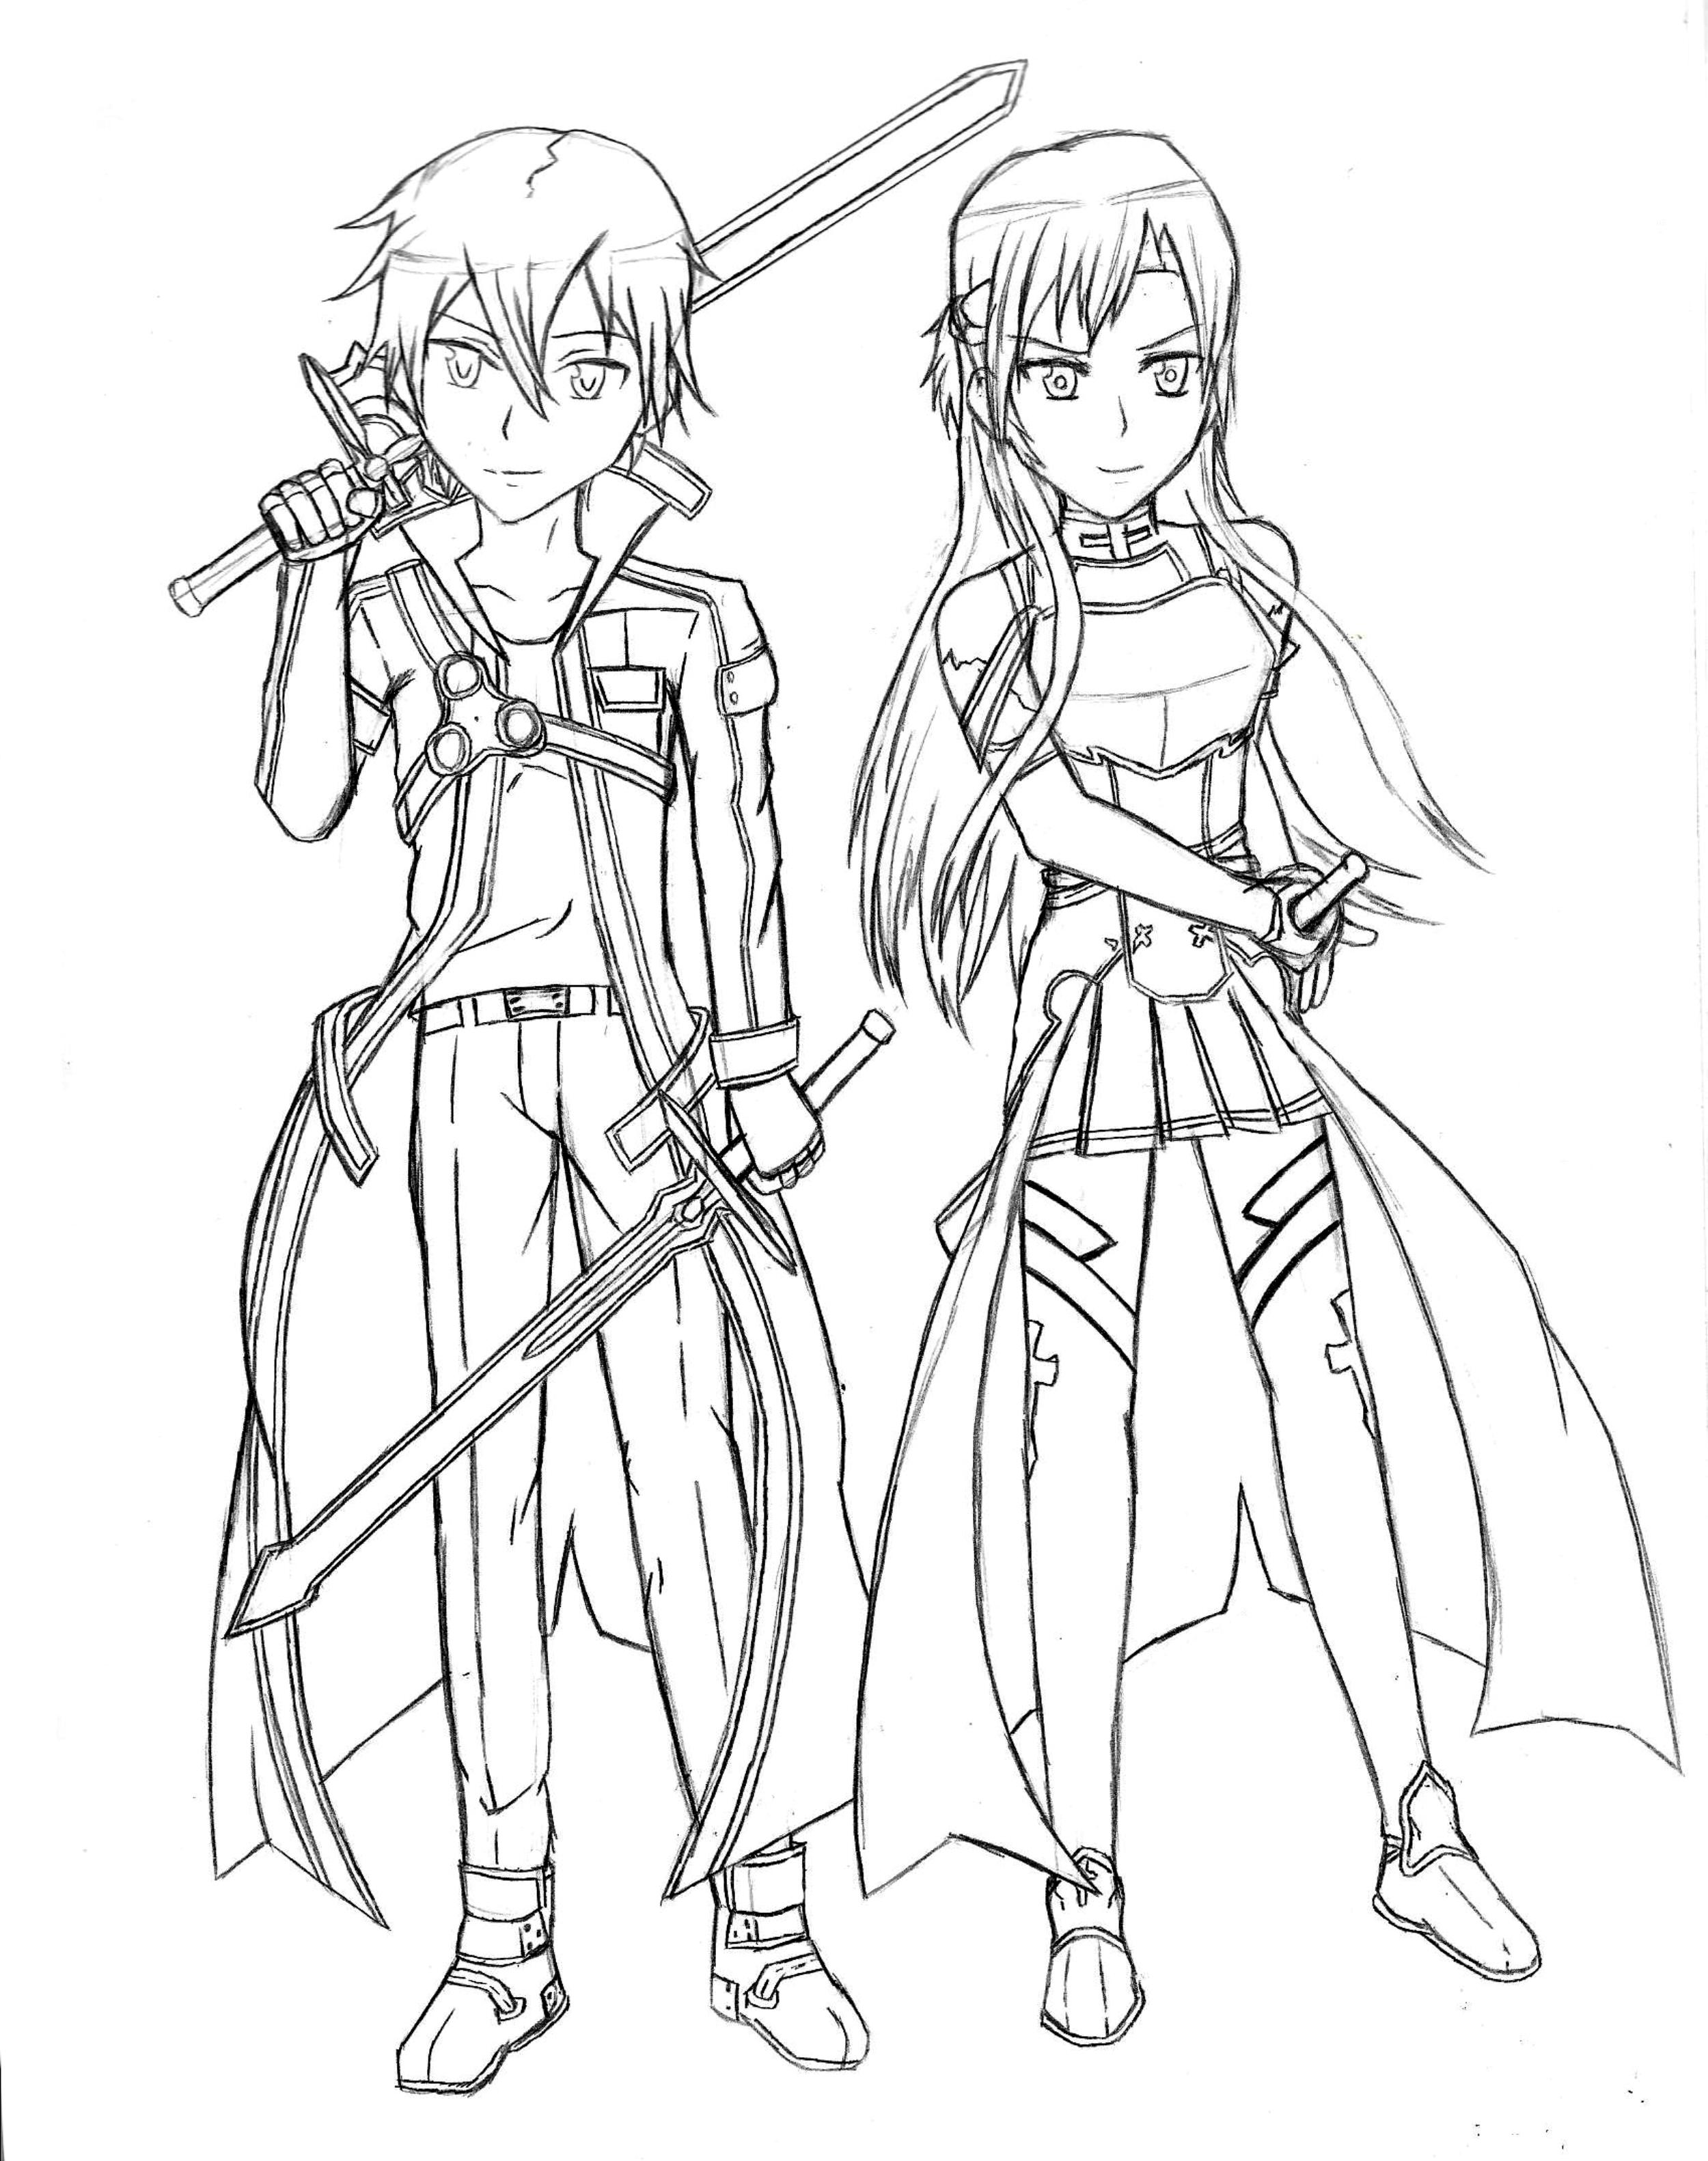 Sword Art Online Kirito and Asuna Coloring Pinterest Chibi ... | 3163x2500